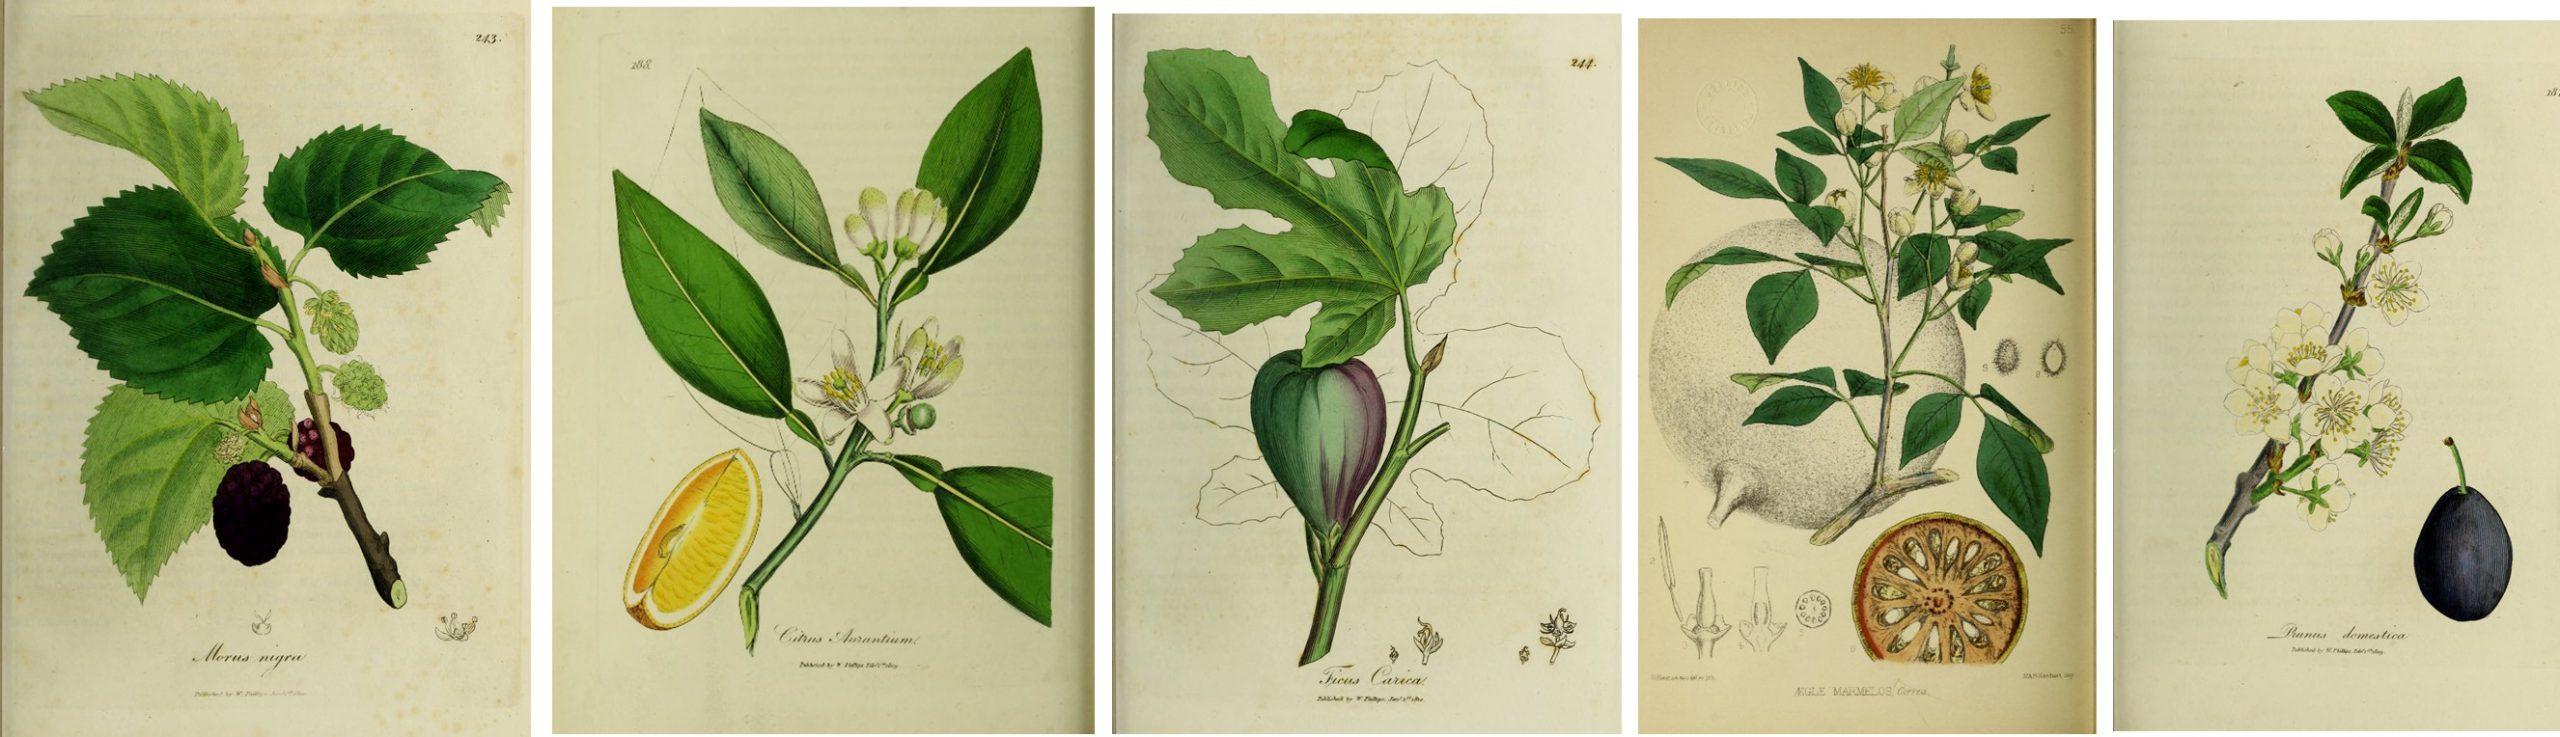 Series of handcolored botanicals: mulberry, orange, fig, orange, and plum